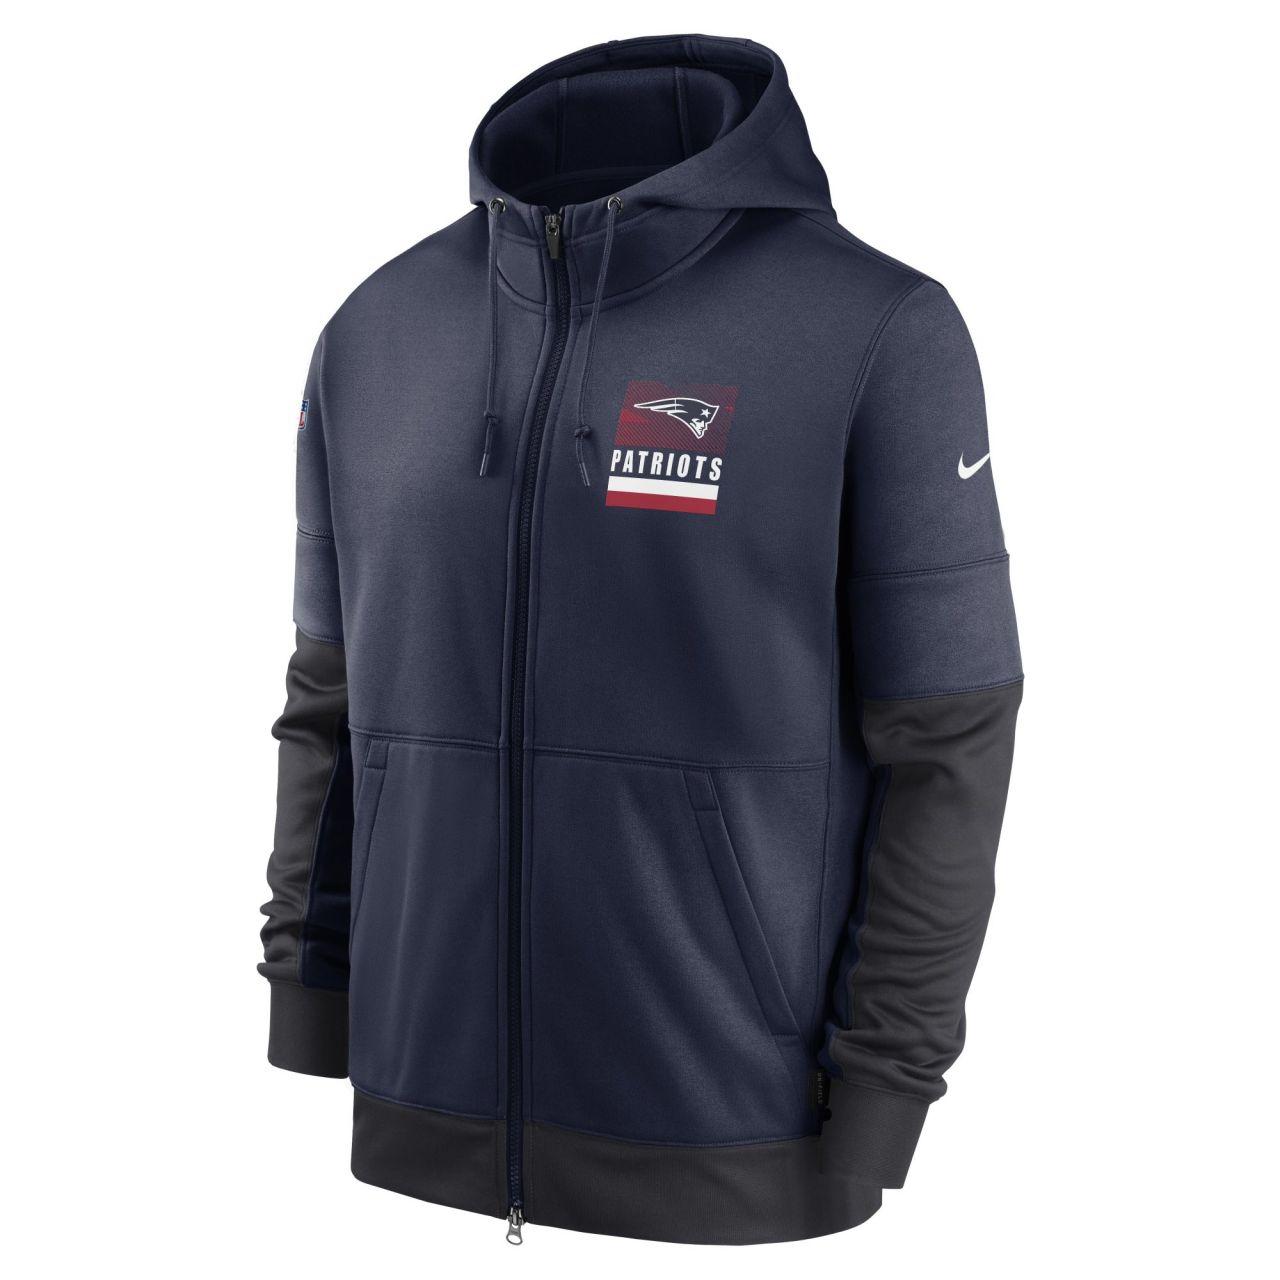 amfoo - Nike NFL Therma Zip Hoody - SIDELINE New England Patriots